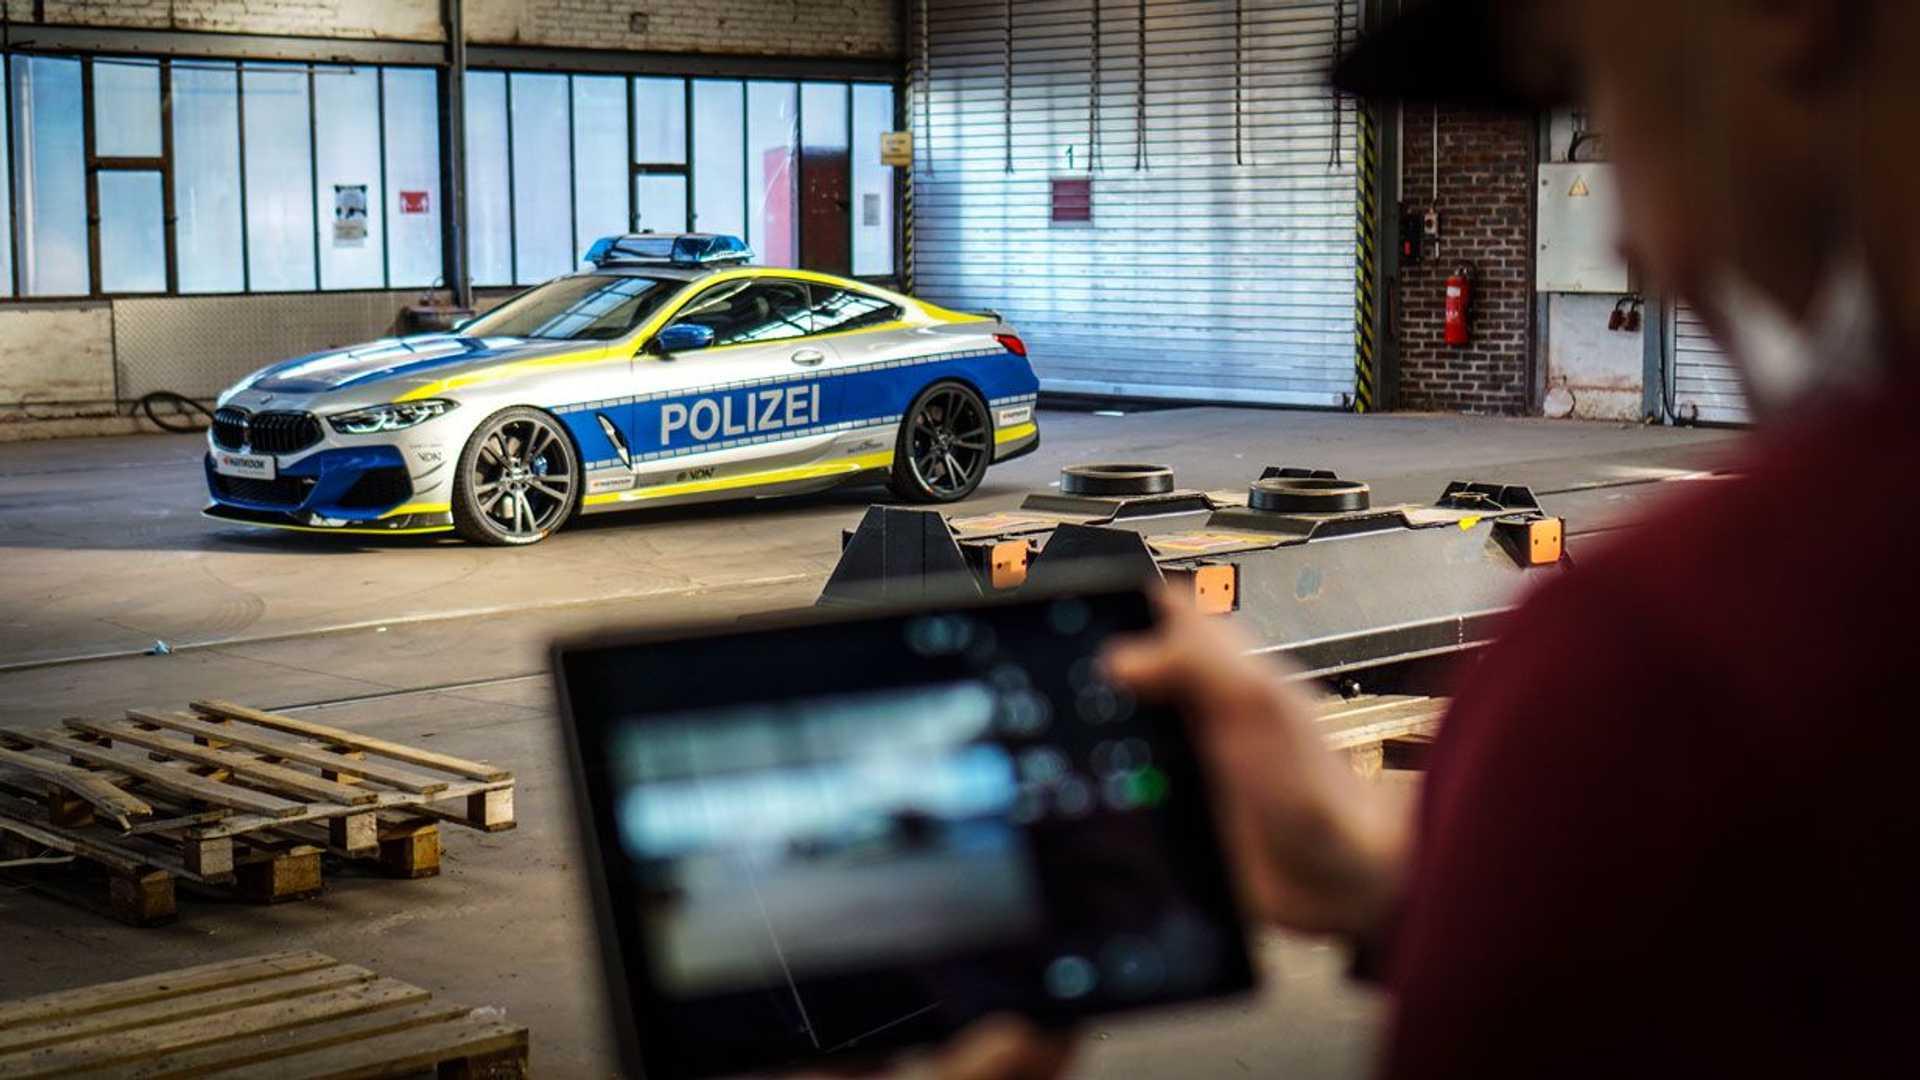 BMW-M850i-police-car-tune-it-safe-12